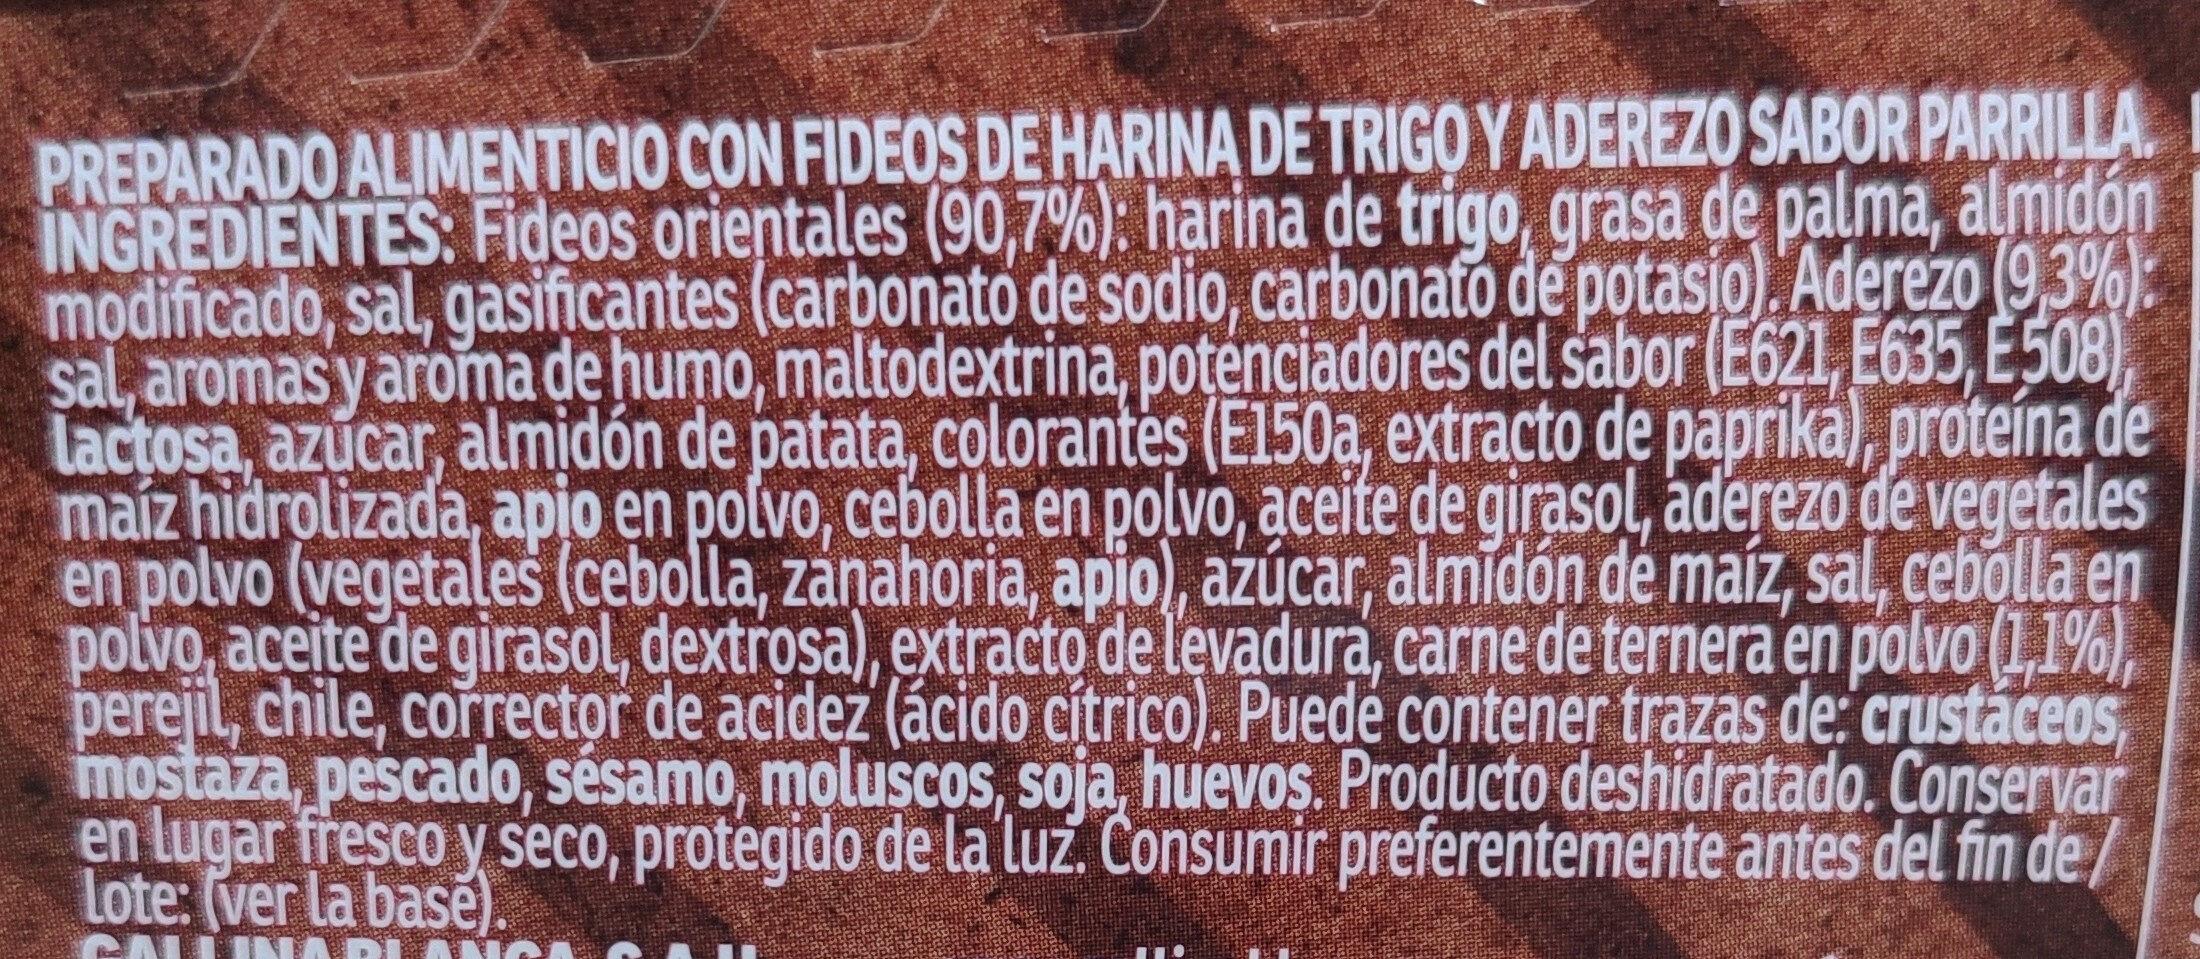 Yatekomo fideos orientales instantáneos parrilla vaso 80 g - Ingredientes